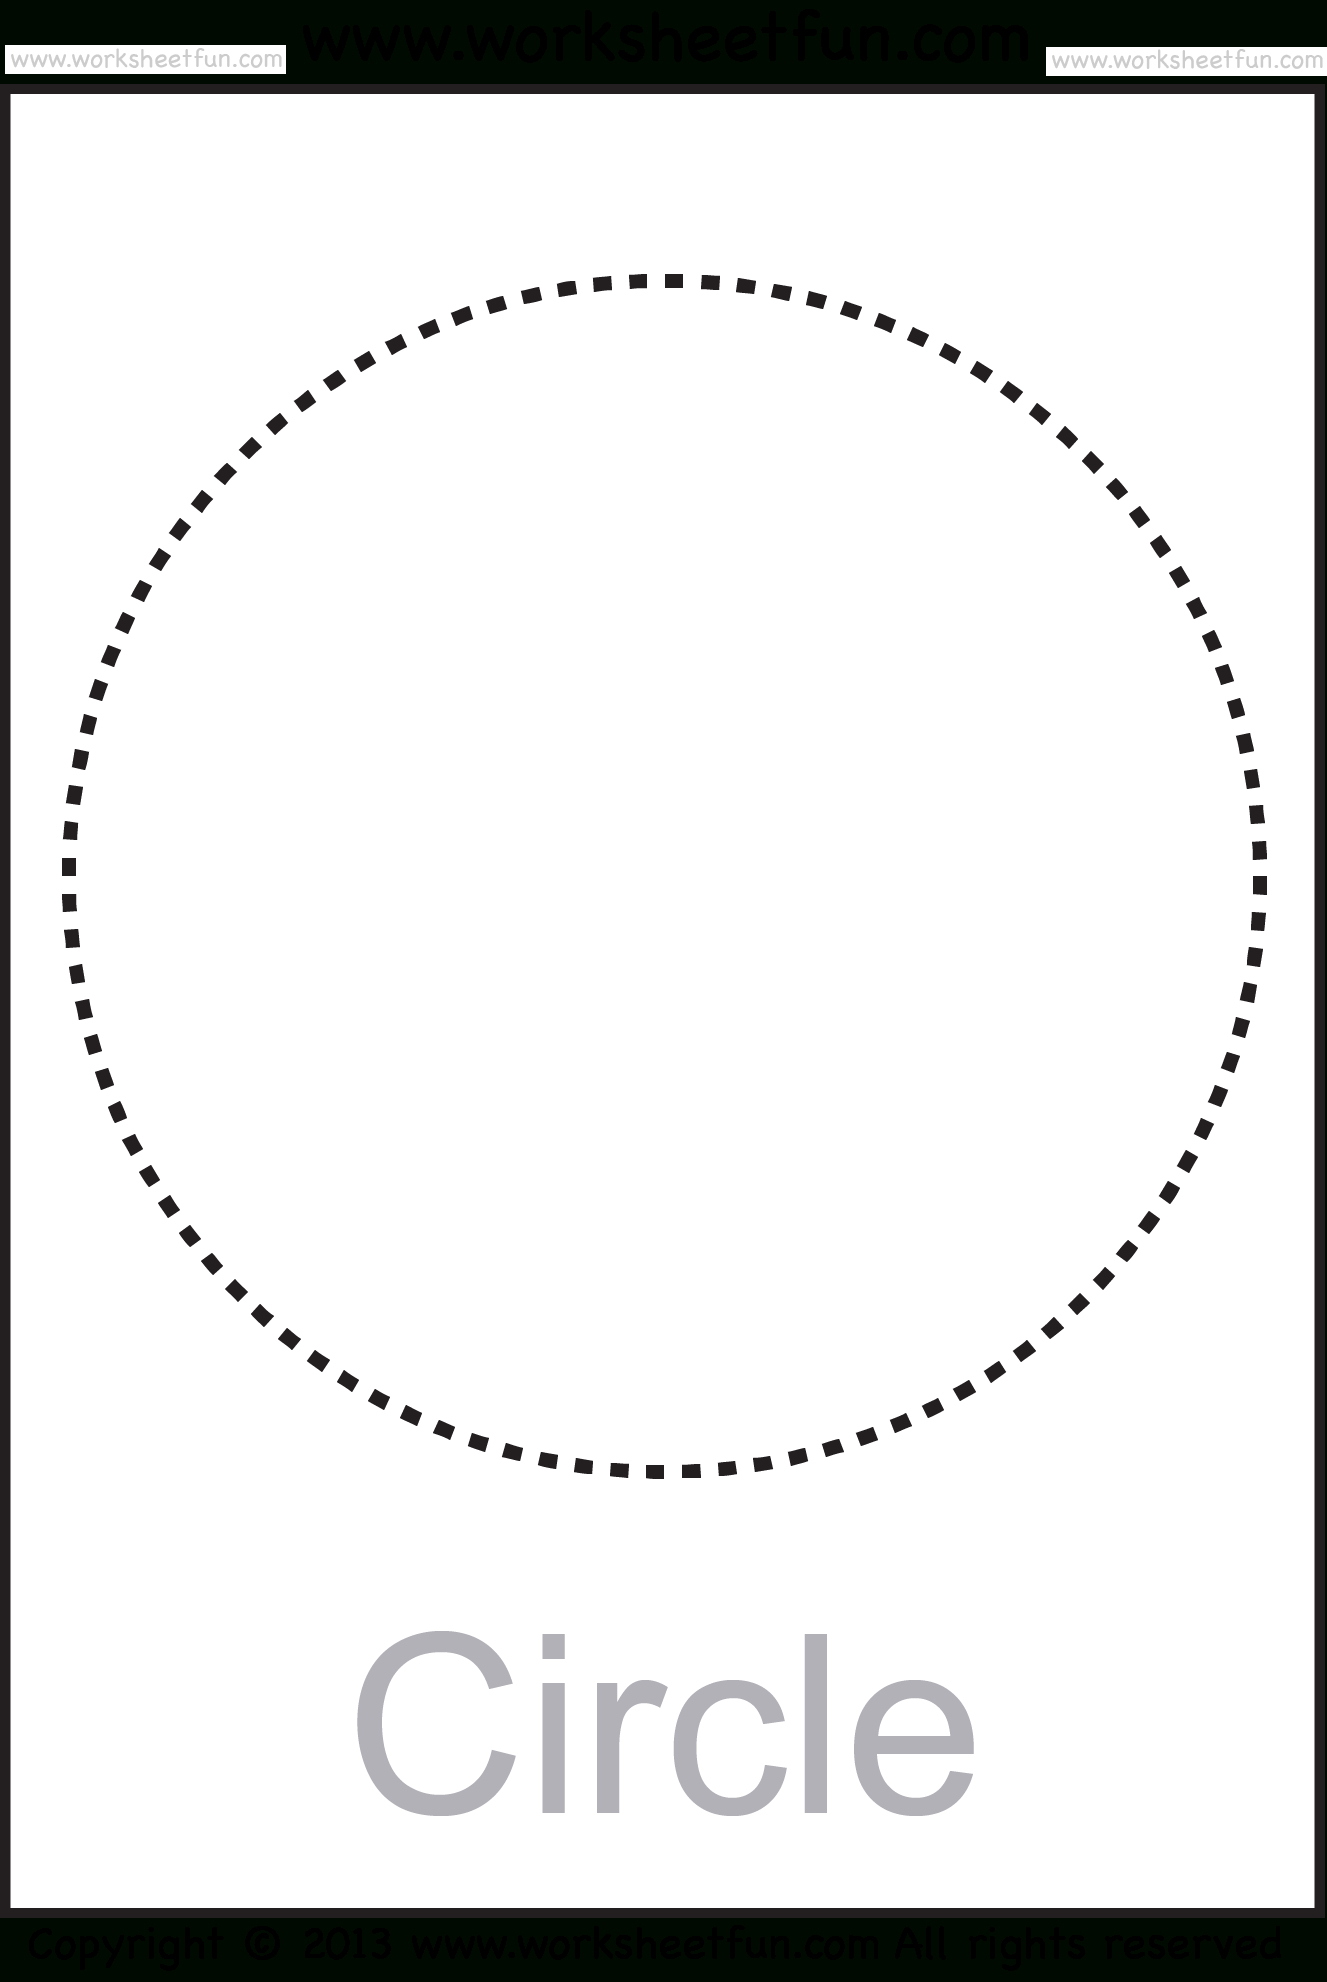 Shapes – Circle, Triangle, Square, Rectangle, Rhombus, Oval – Six - Large Printable Shapes Free